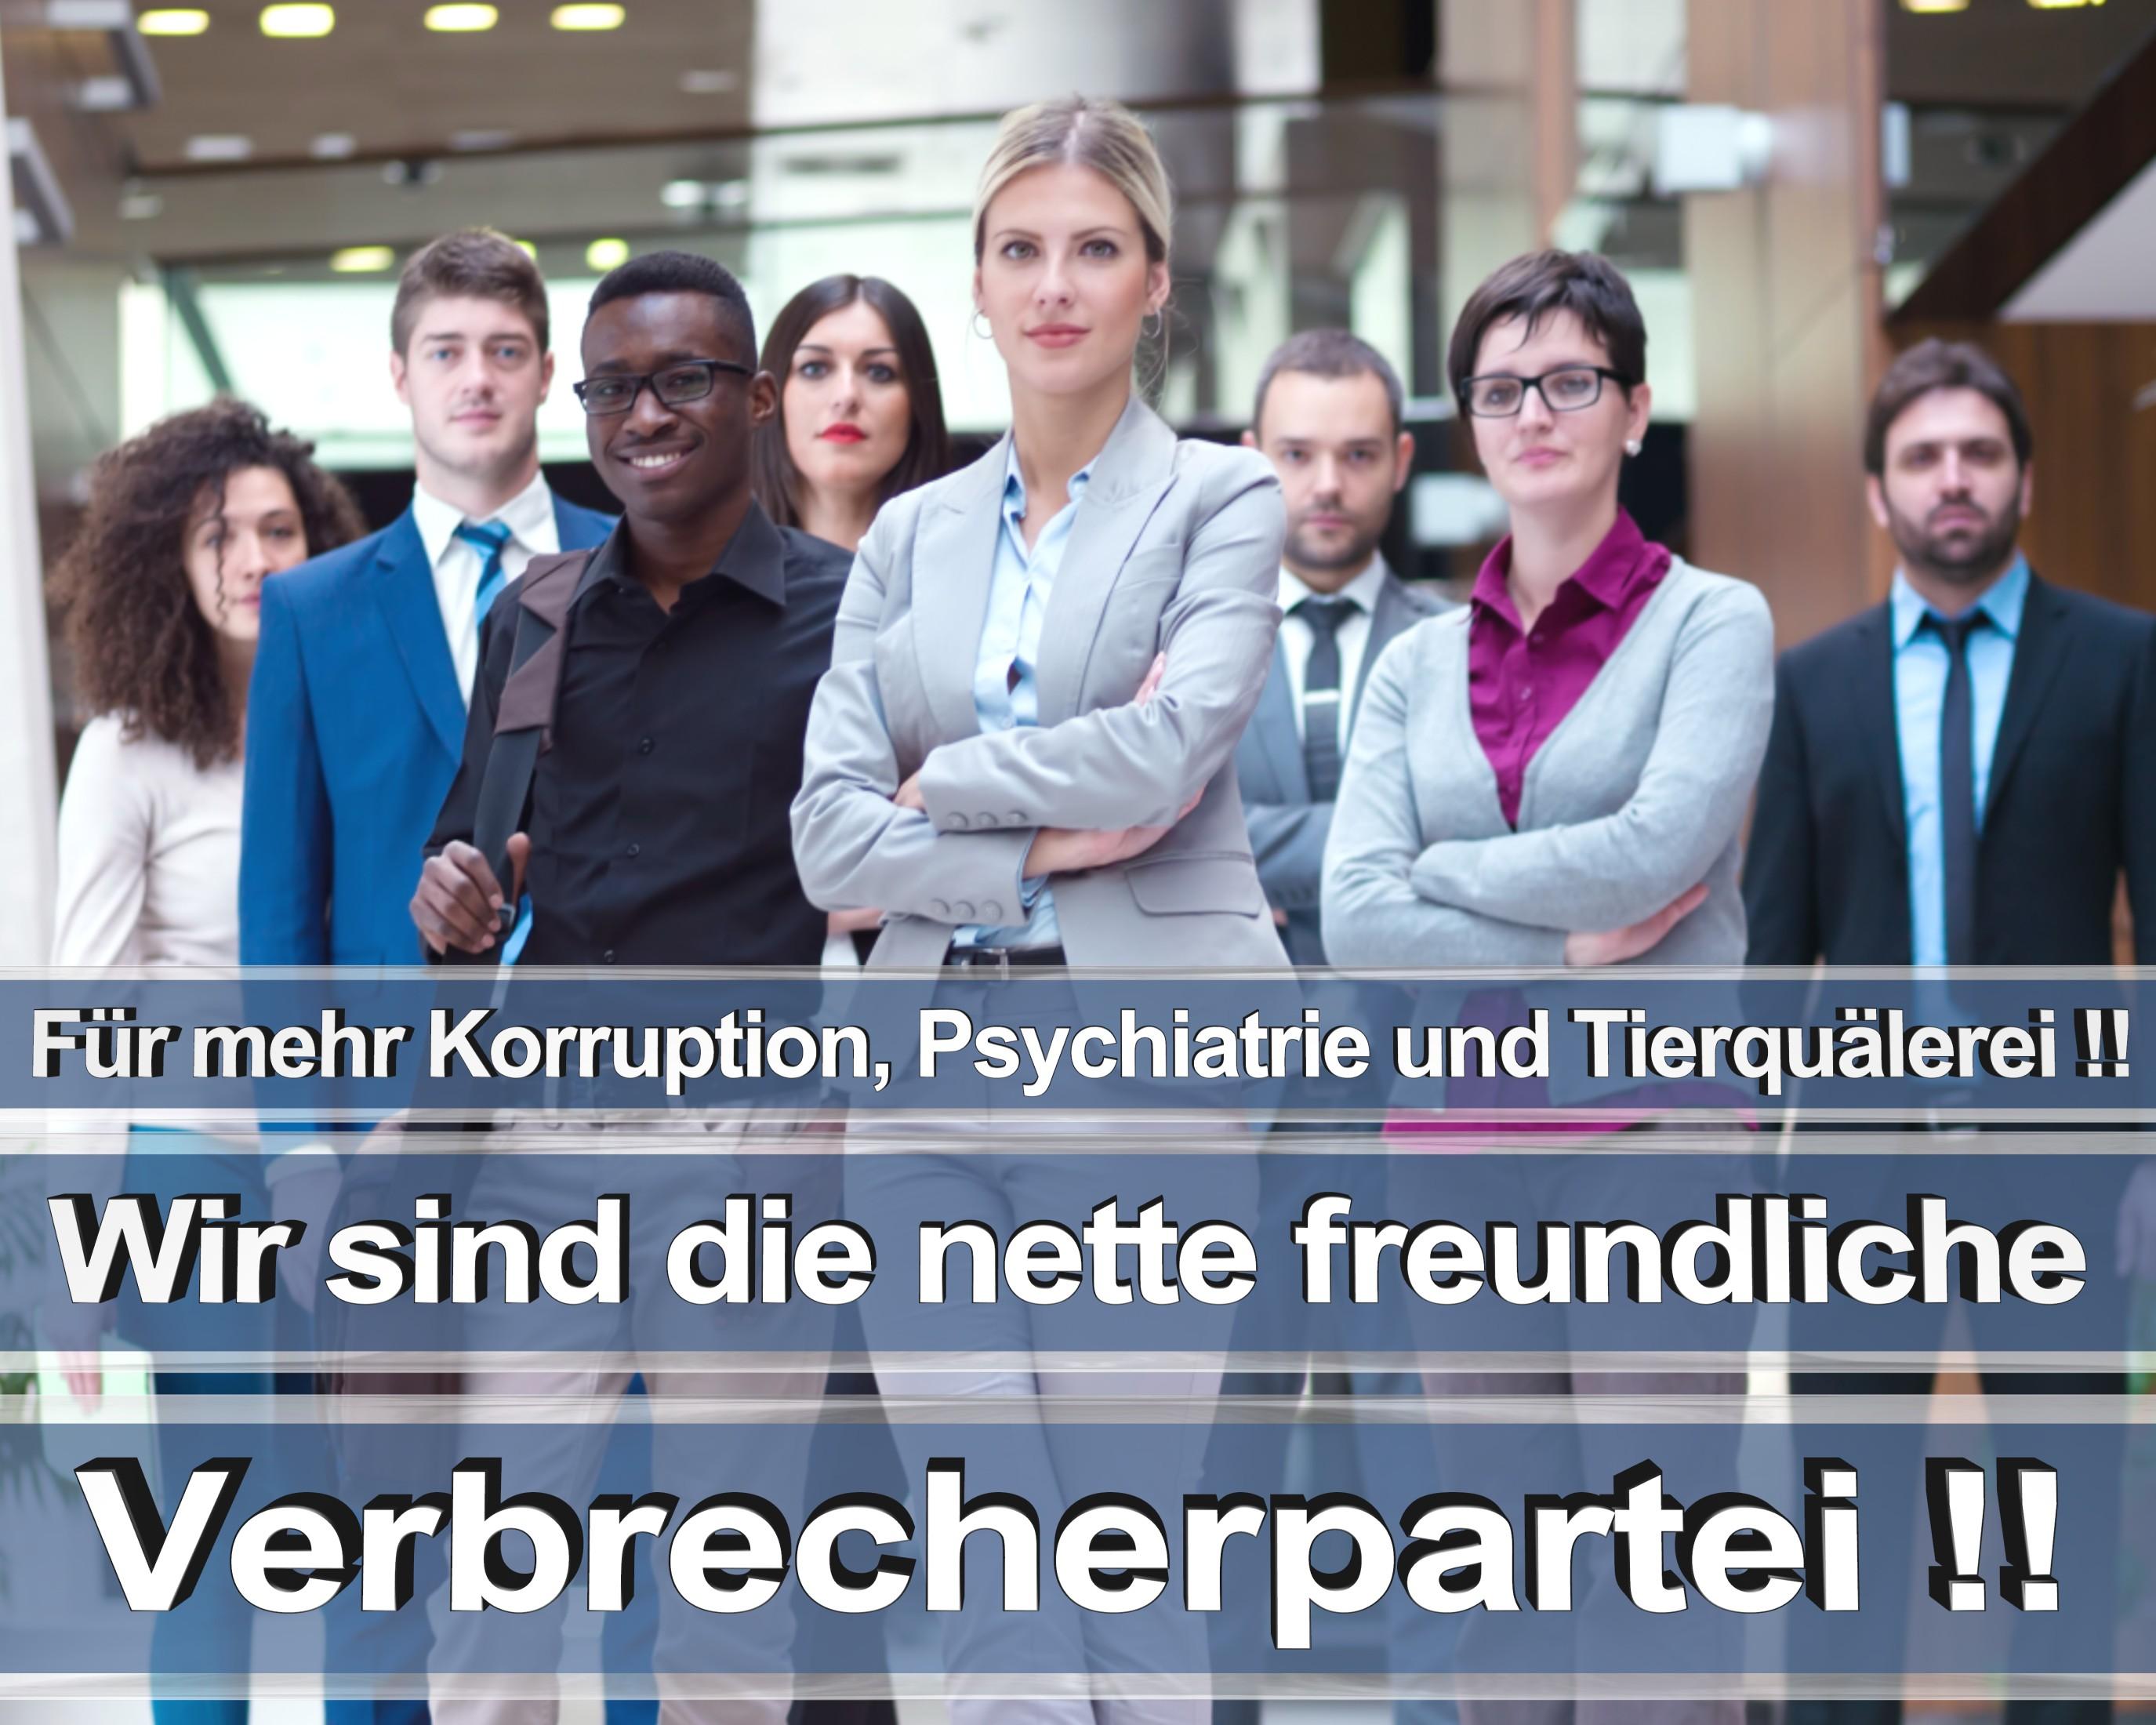 FDP Bielefeld Jan Maik Schlifter, Jasmin Wahl Schwentker, Jens Andernacht, Laura Schubert, Dr Klaus Schleicher, Rainer Seifert (9)